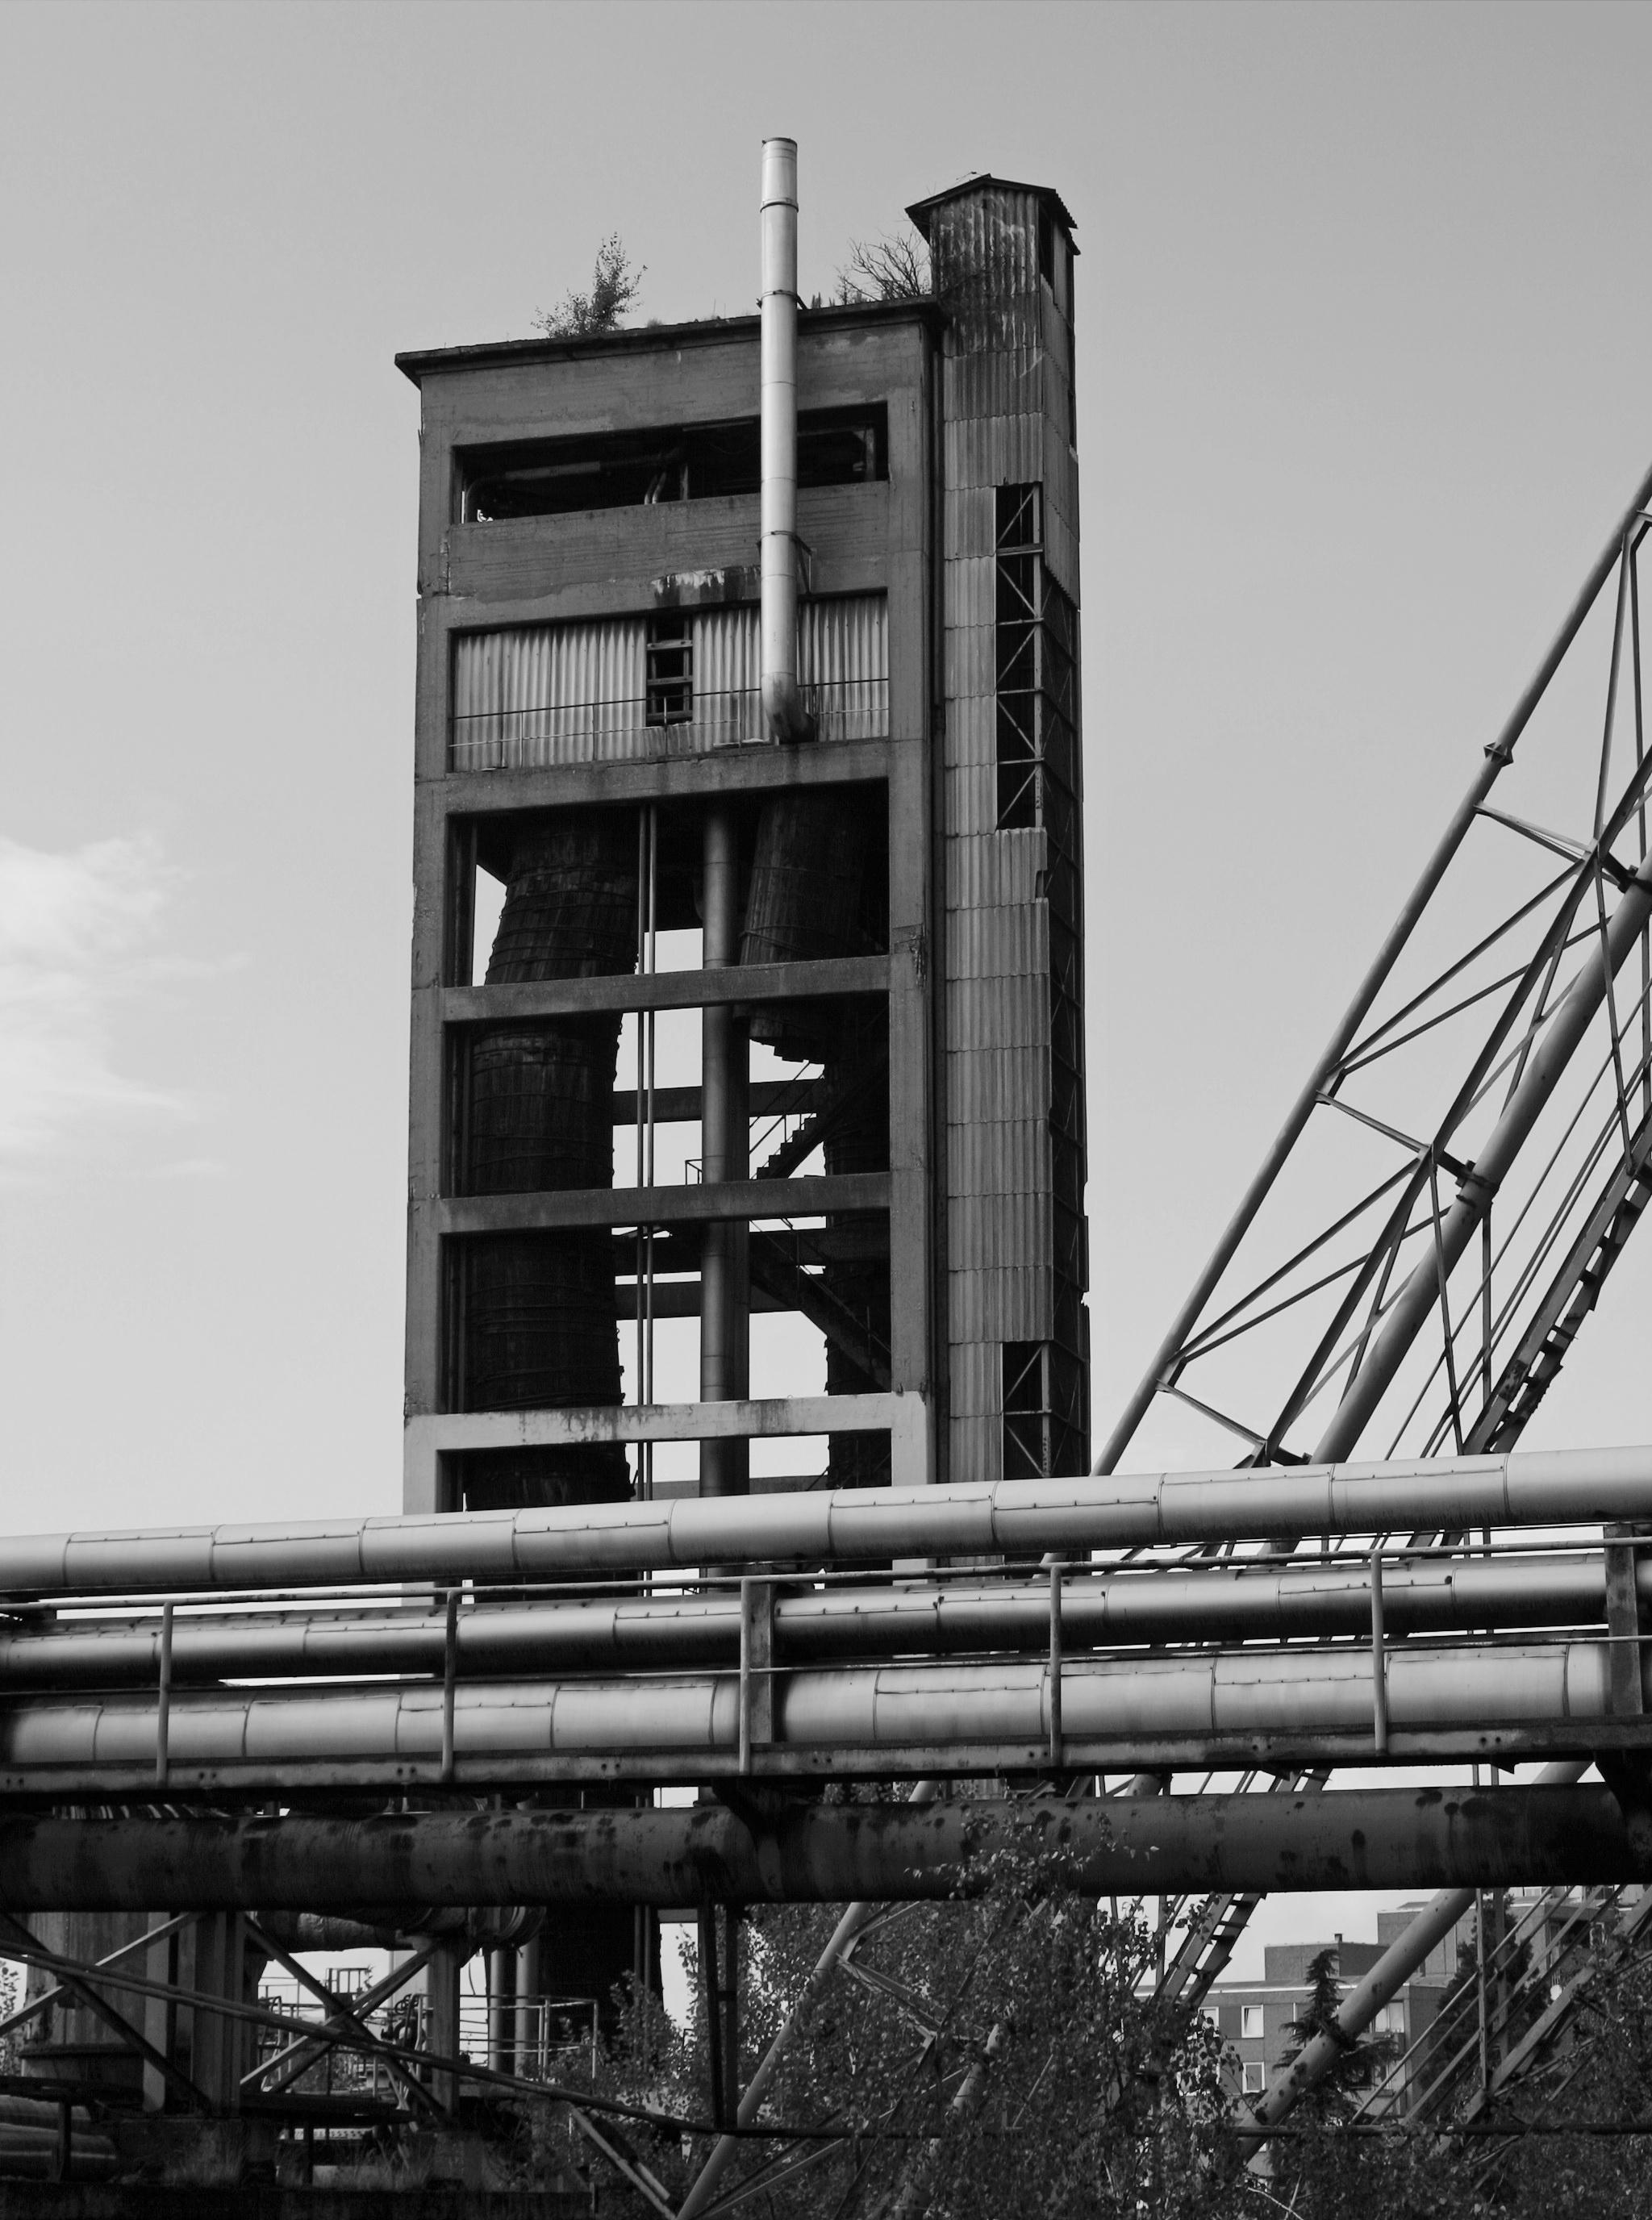 https://orig00.deviantart.net/c4eb/f/2018/012/4/7/abandoned__factory_by_udochristmann-dbzqllb.jpg